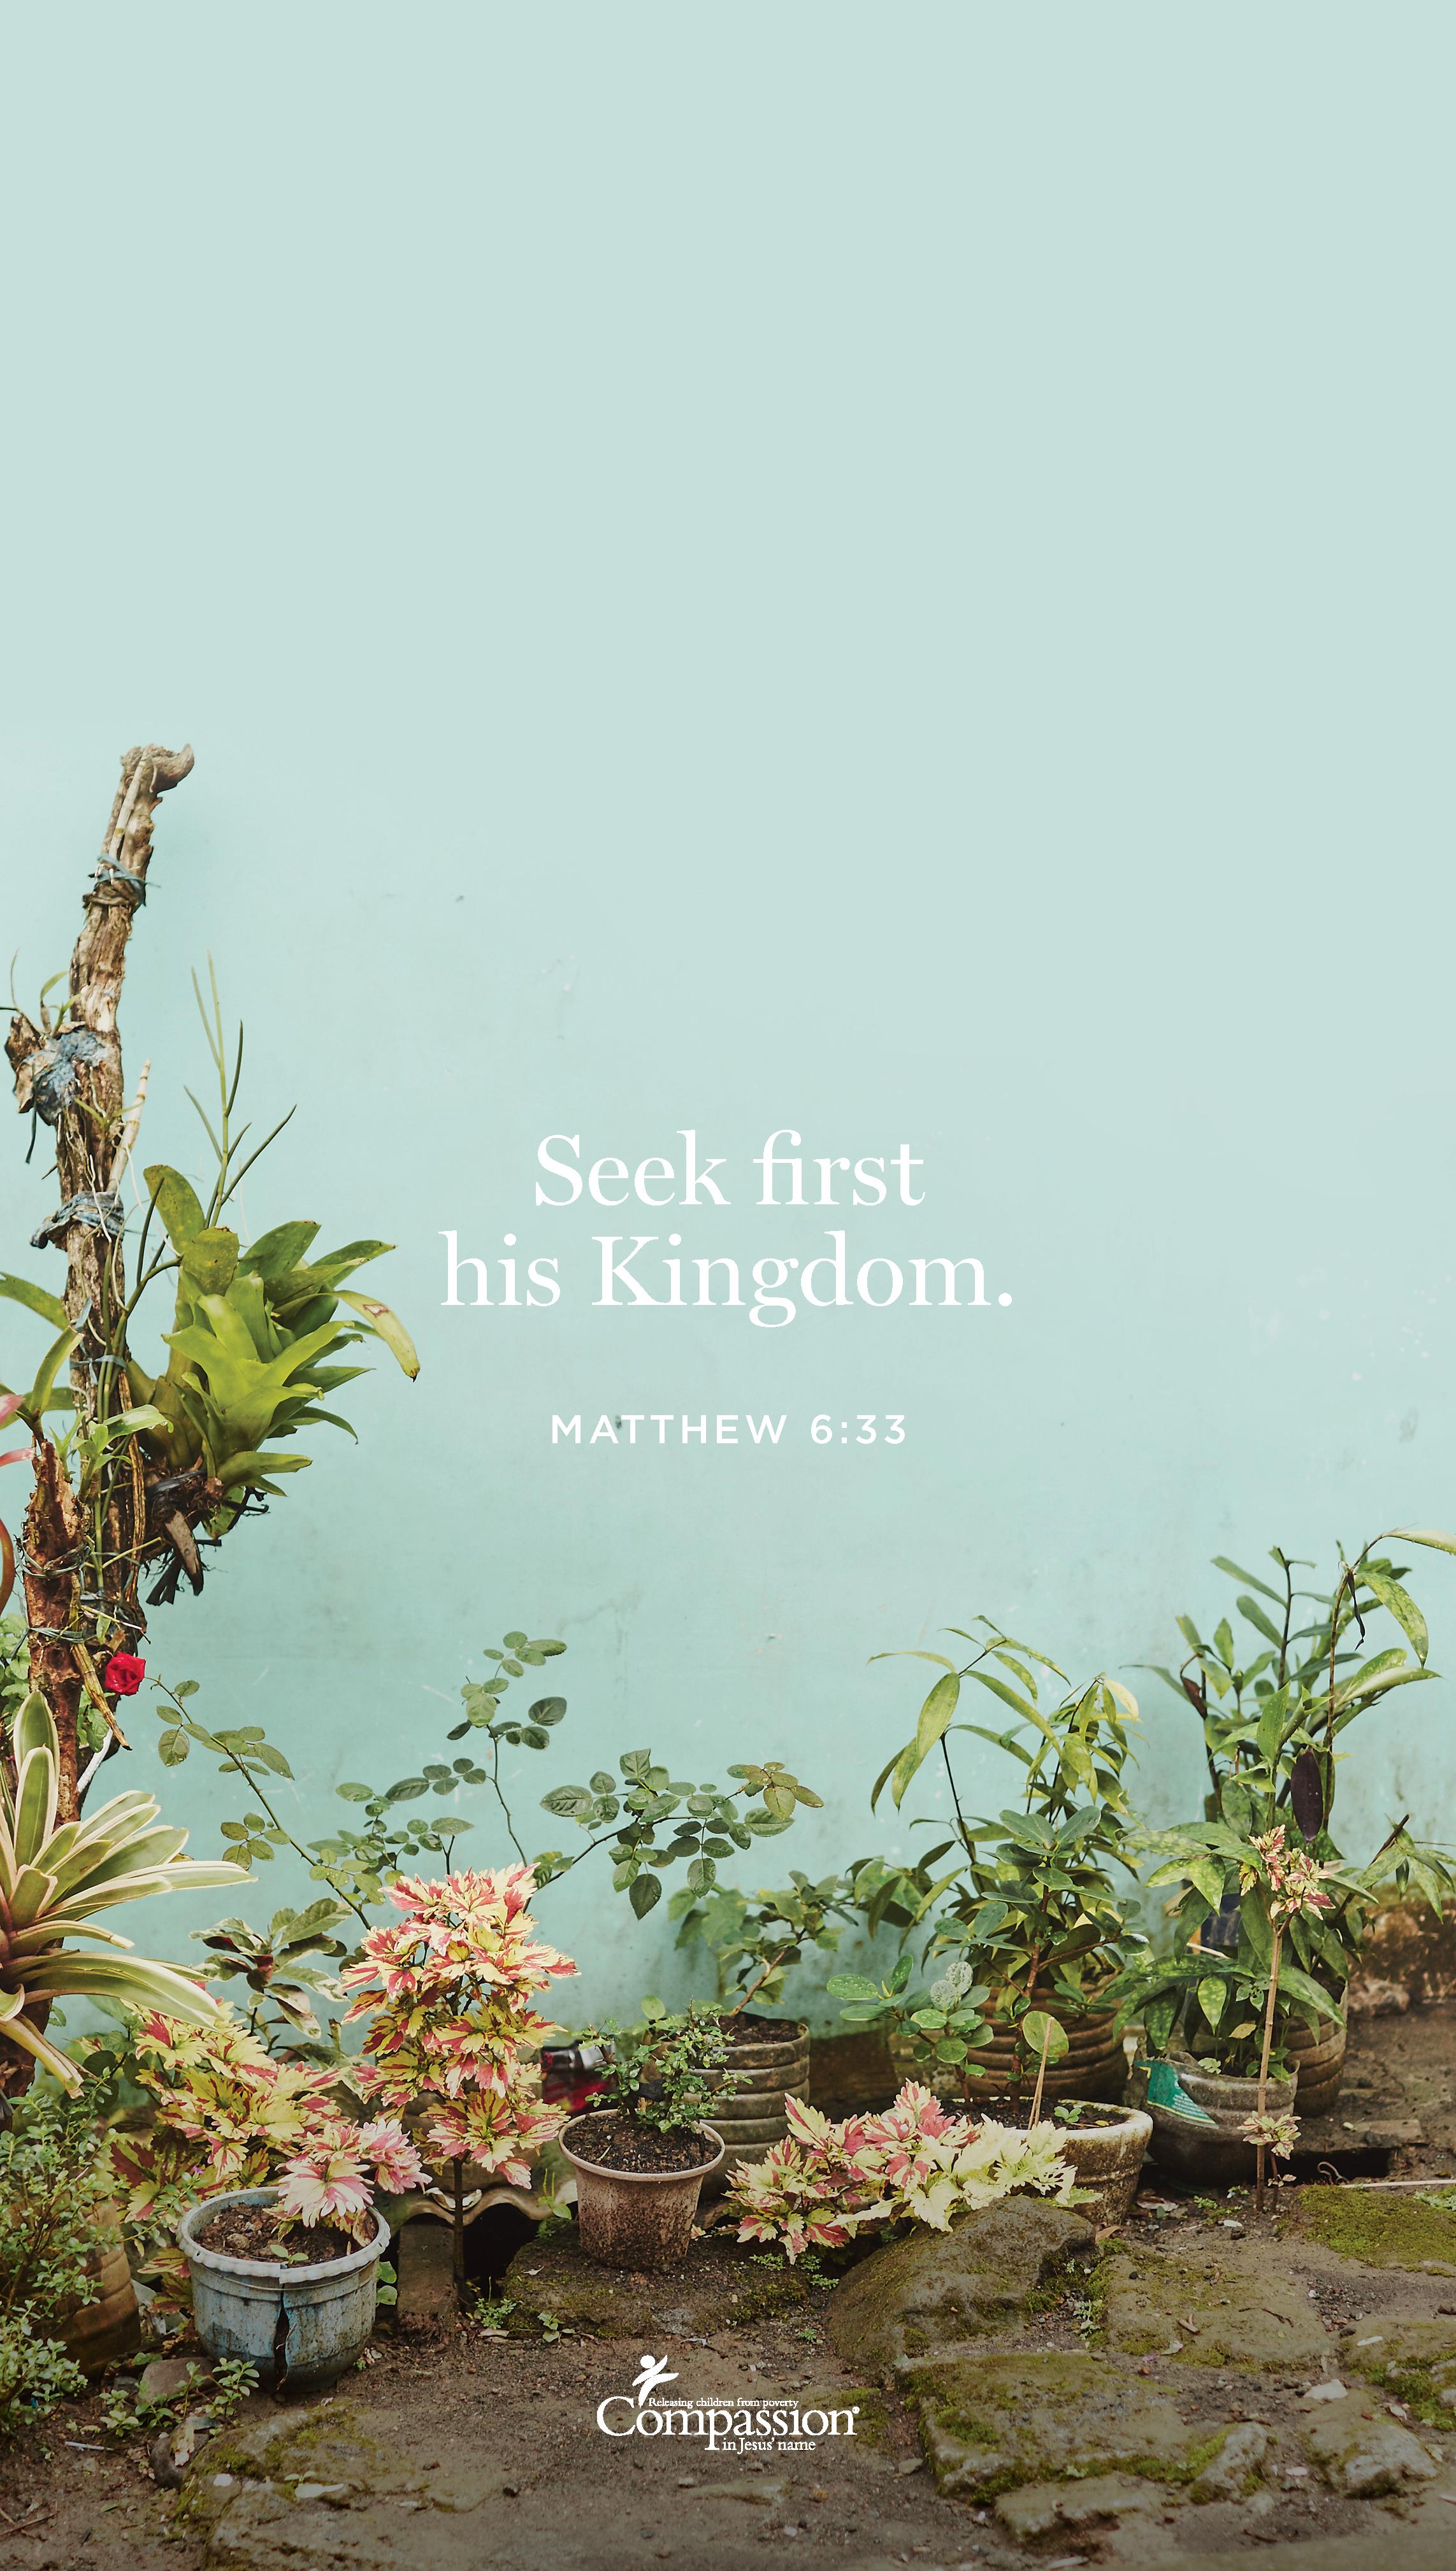 11 Uplifting Bible Verses That Will Refresh Your Spirit